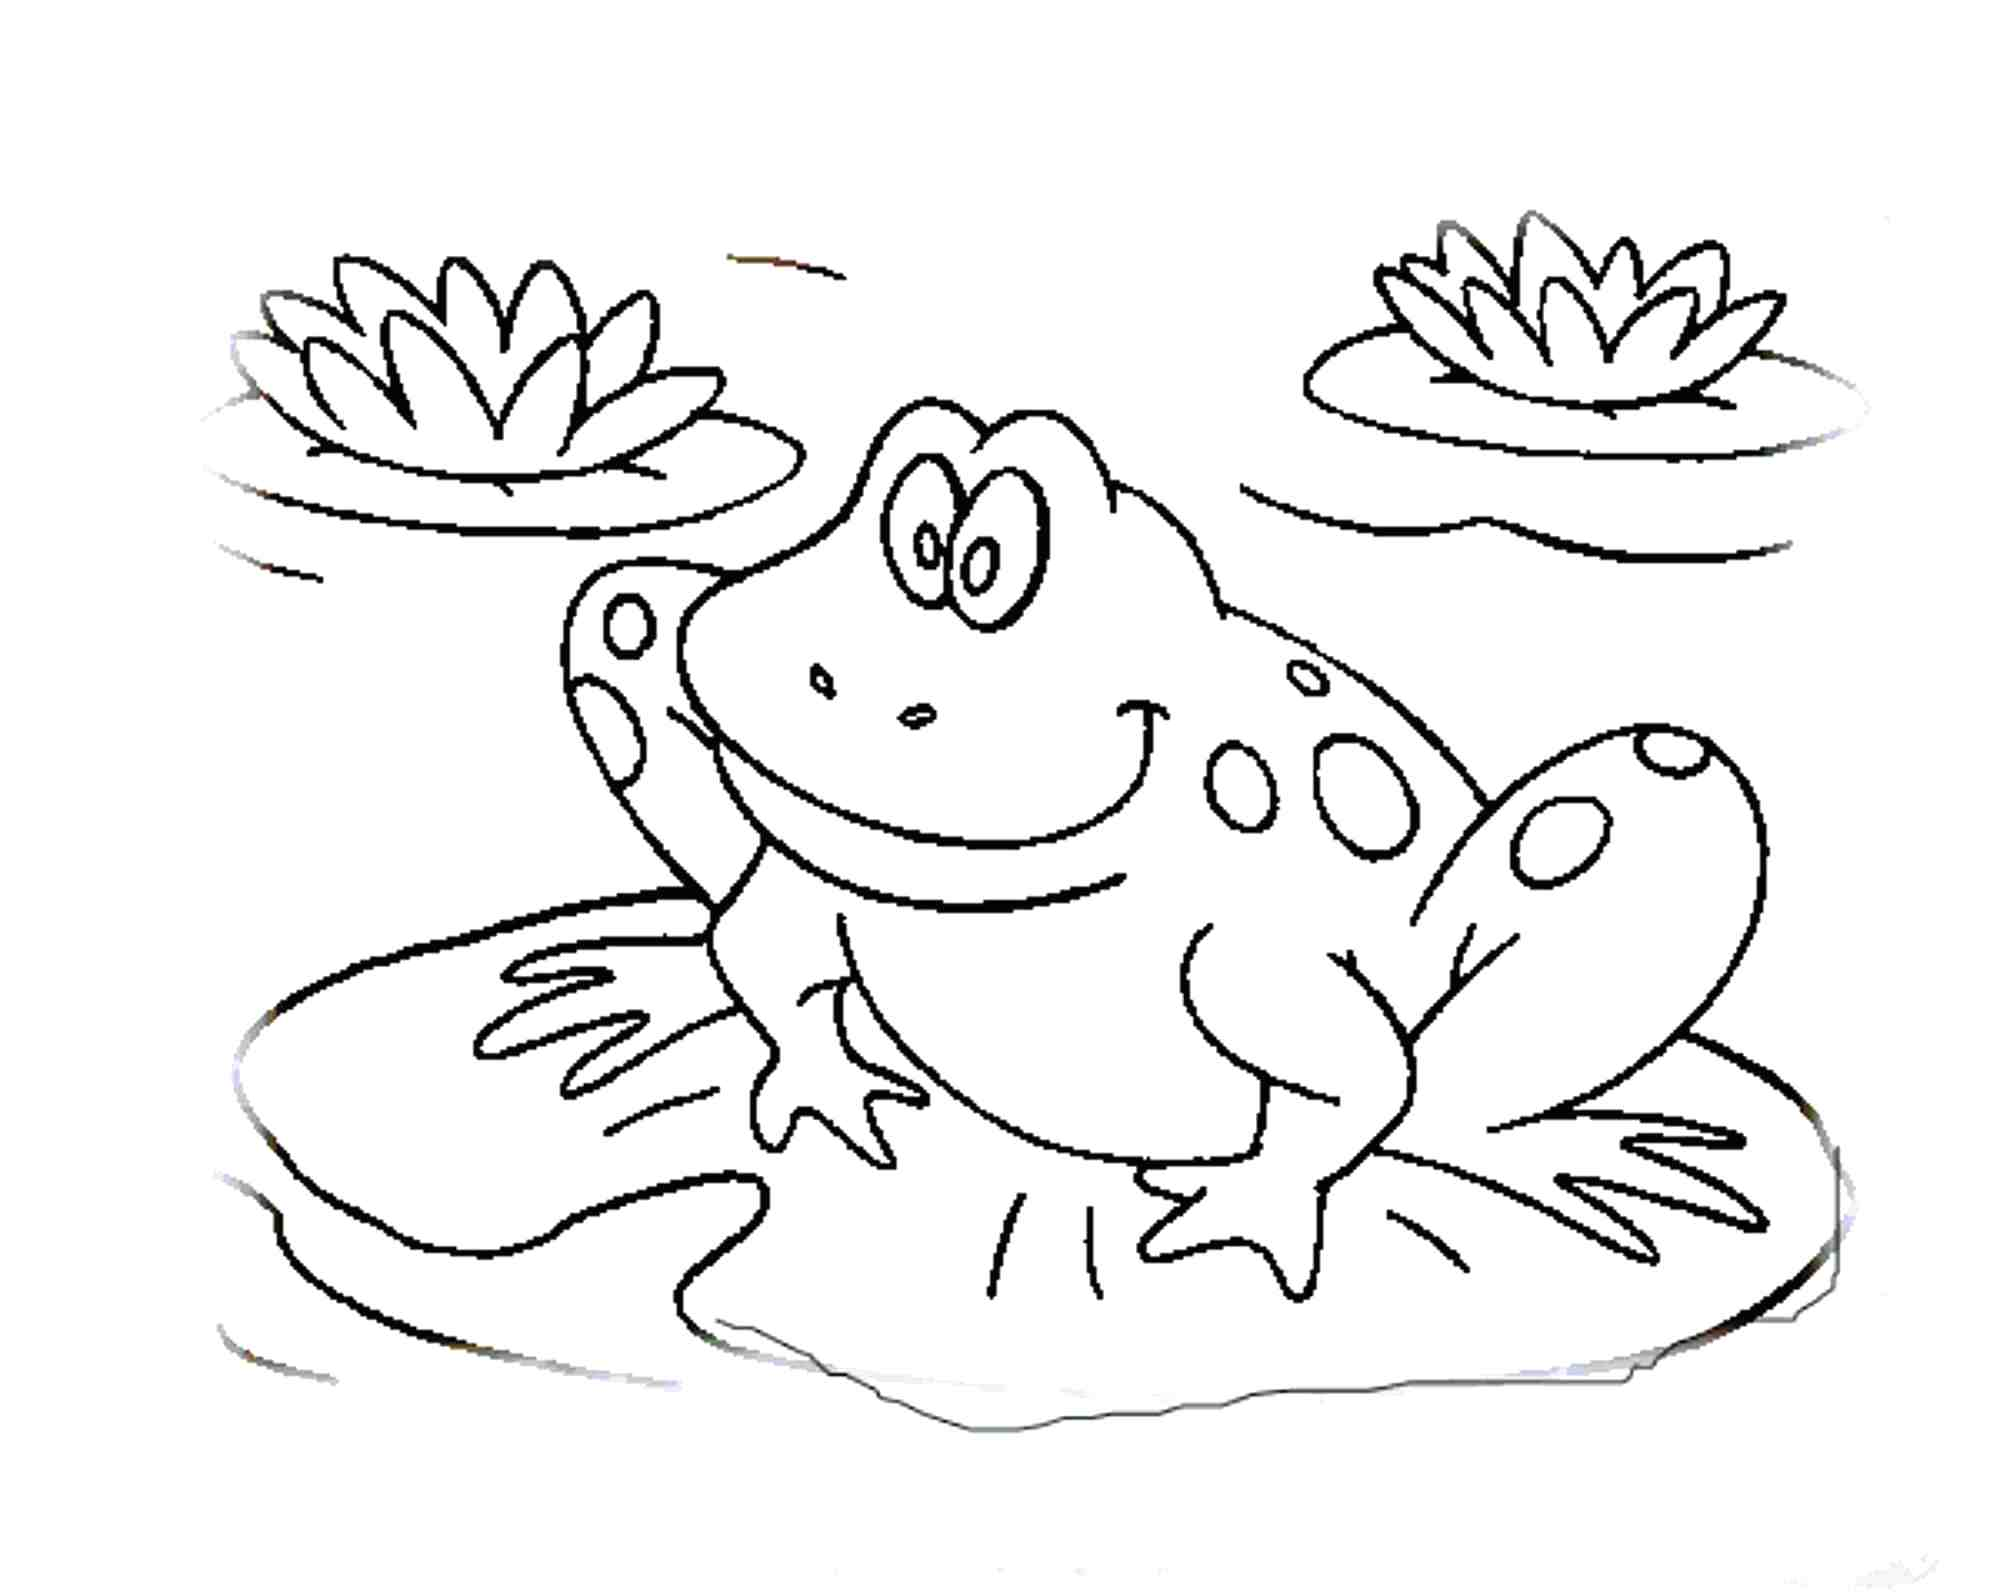 Leap Frog Drawing At Getdrawings